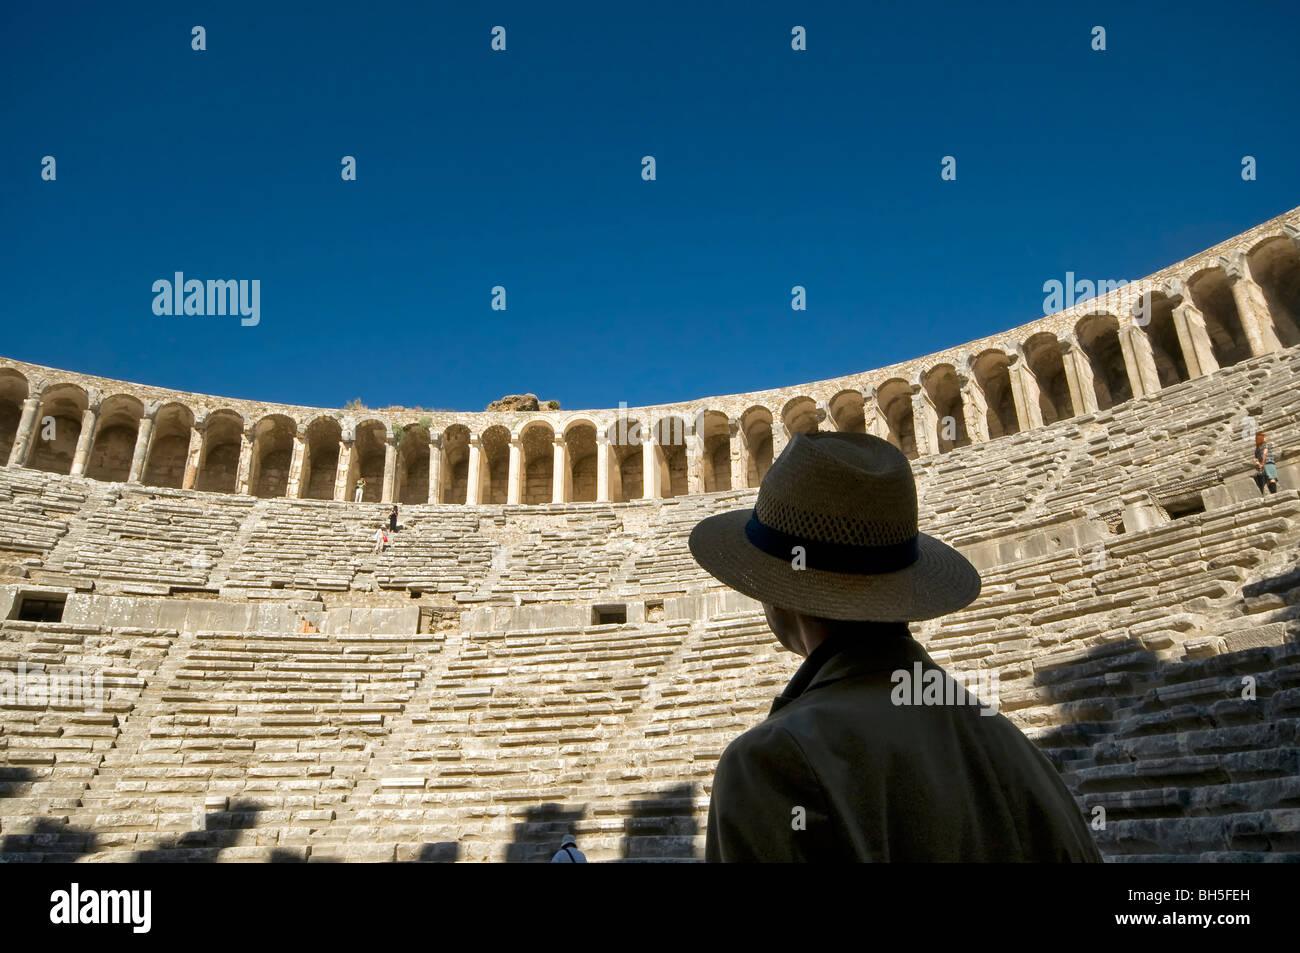 Aspendos Antique Theater in Antalya Turkey - Stock Image